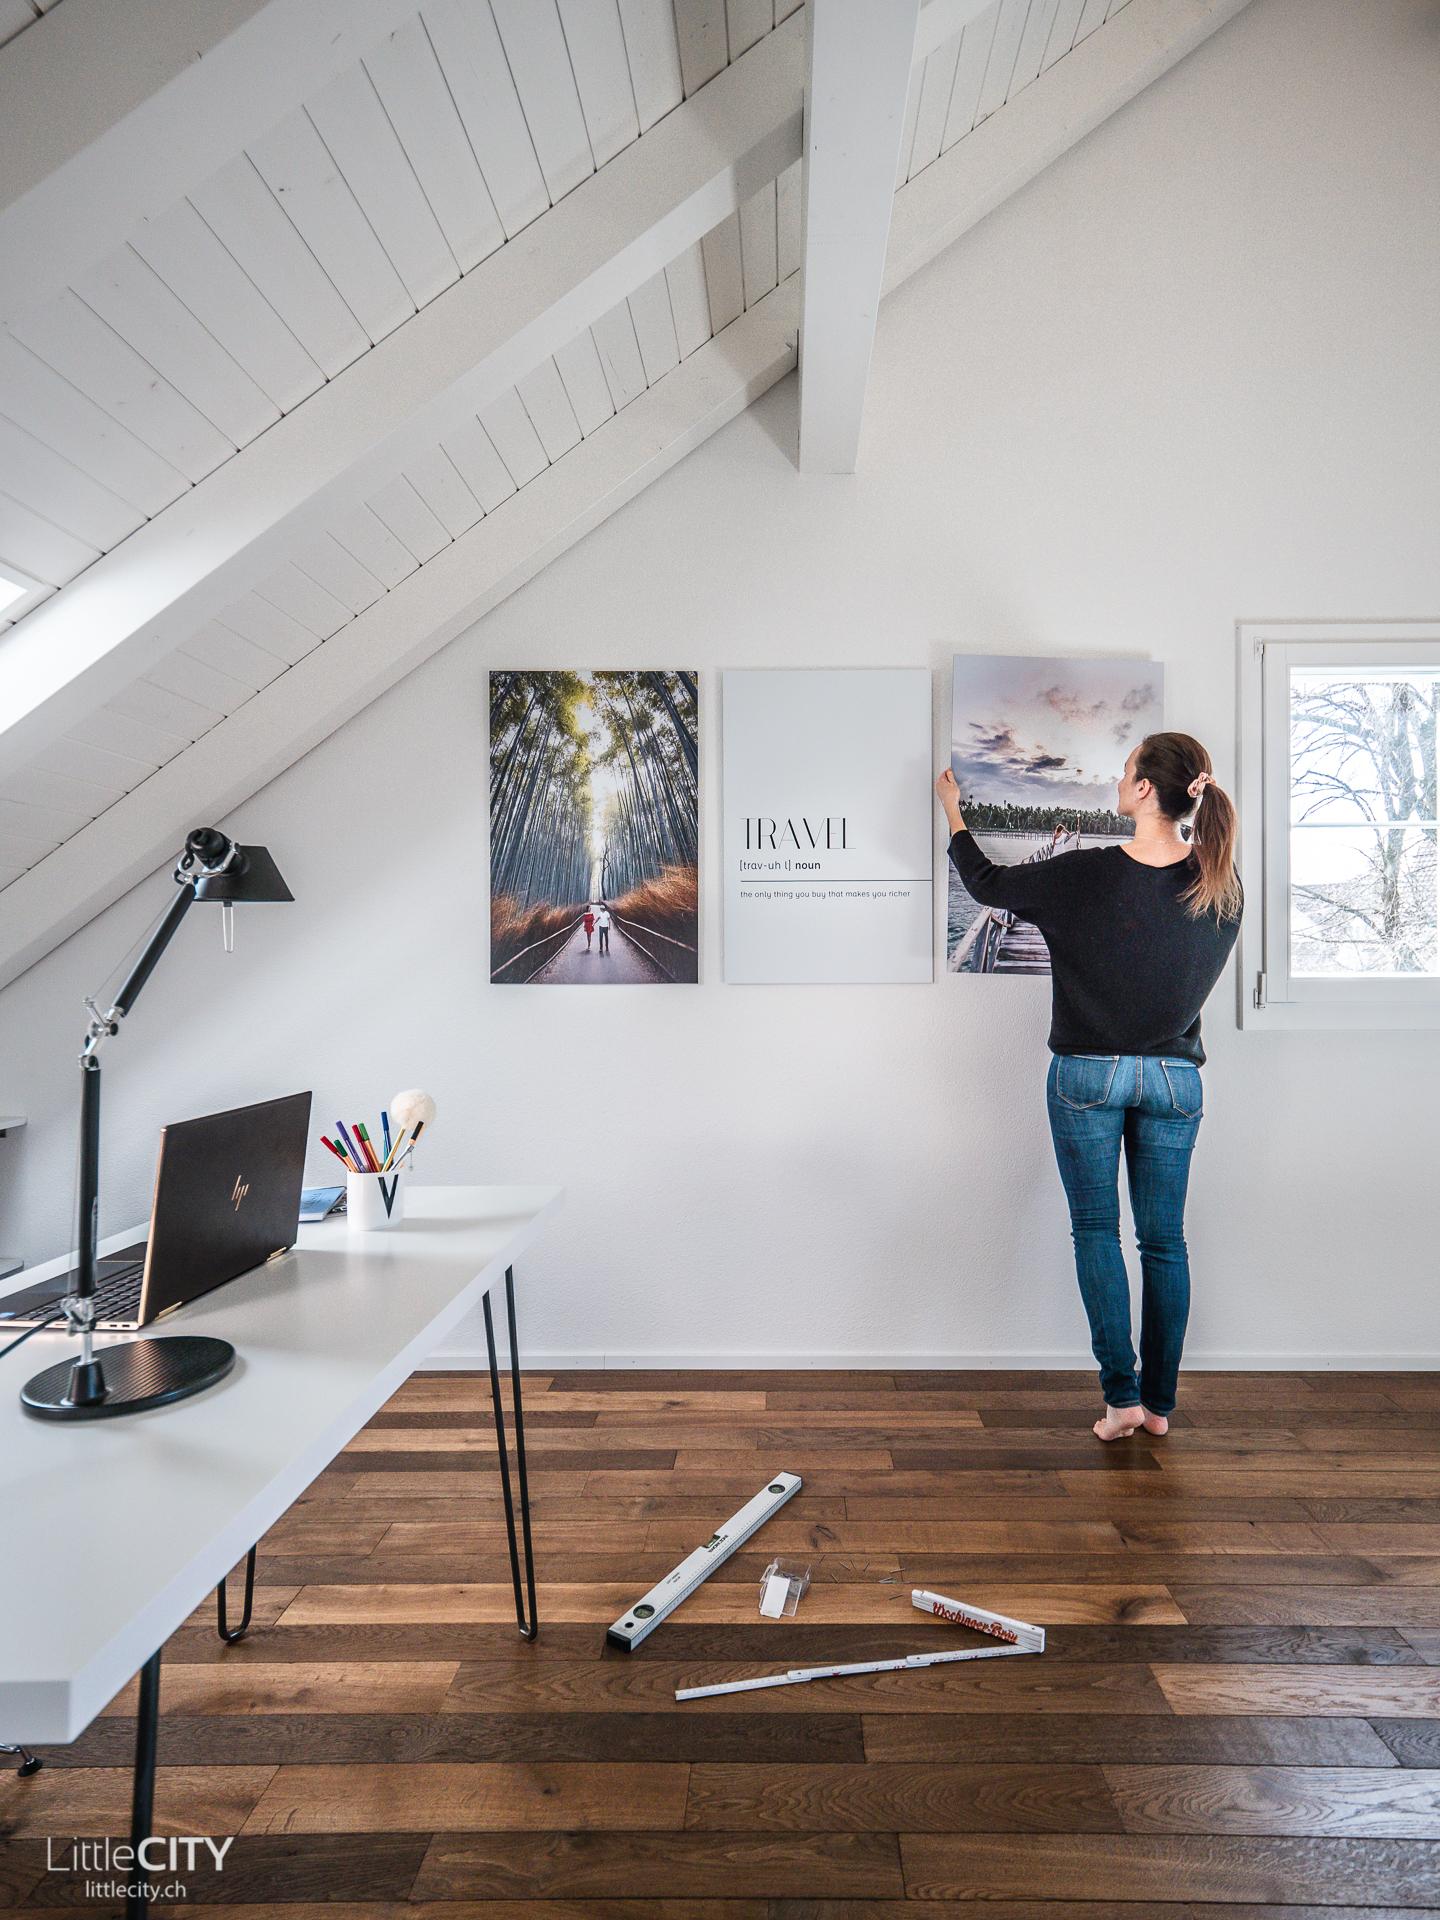 Büro Inspiration Bilder Foto Prints